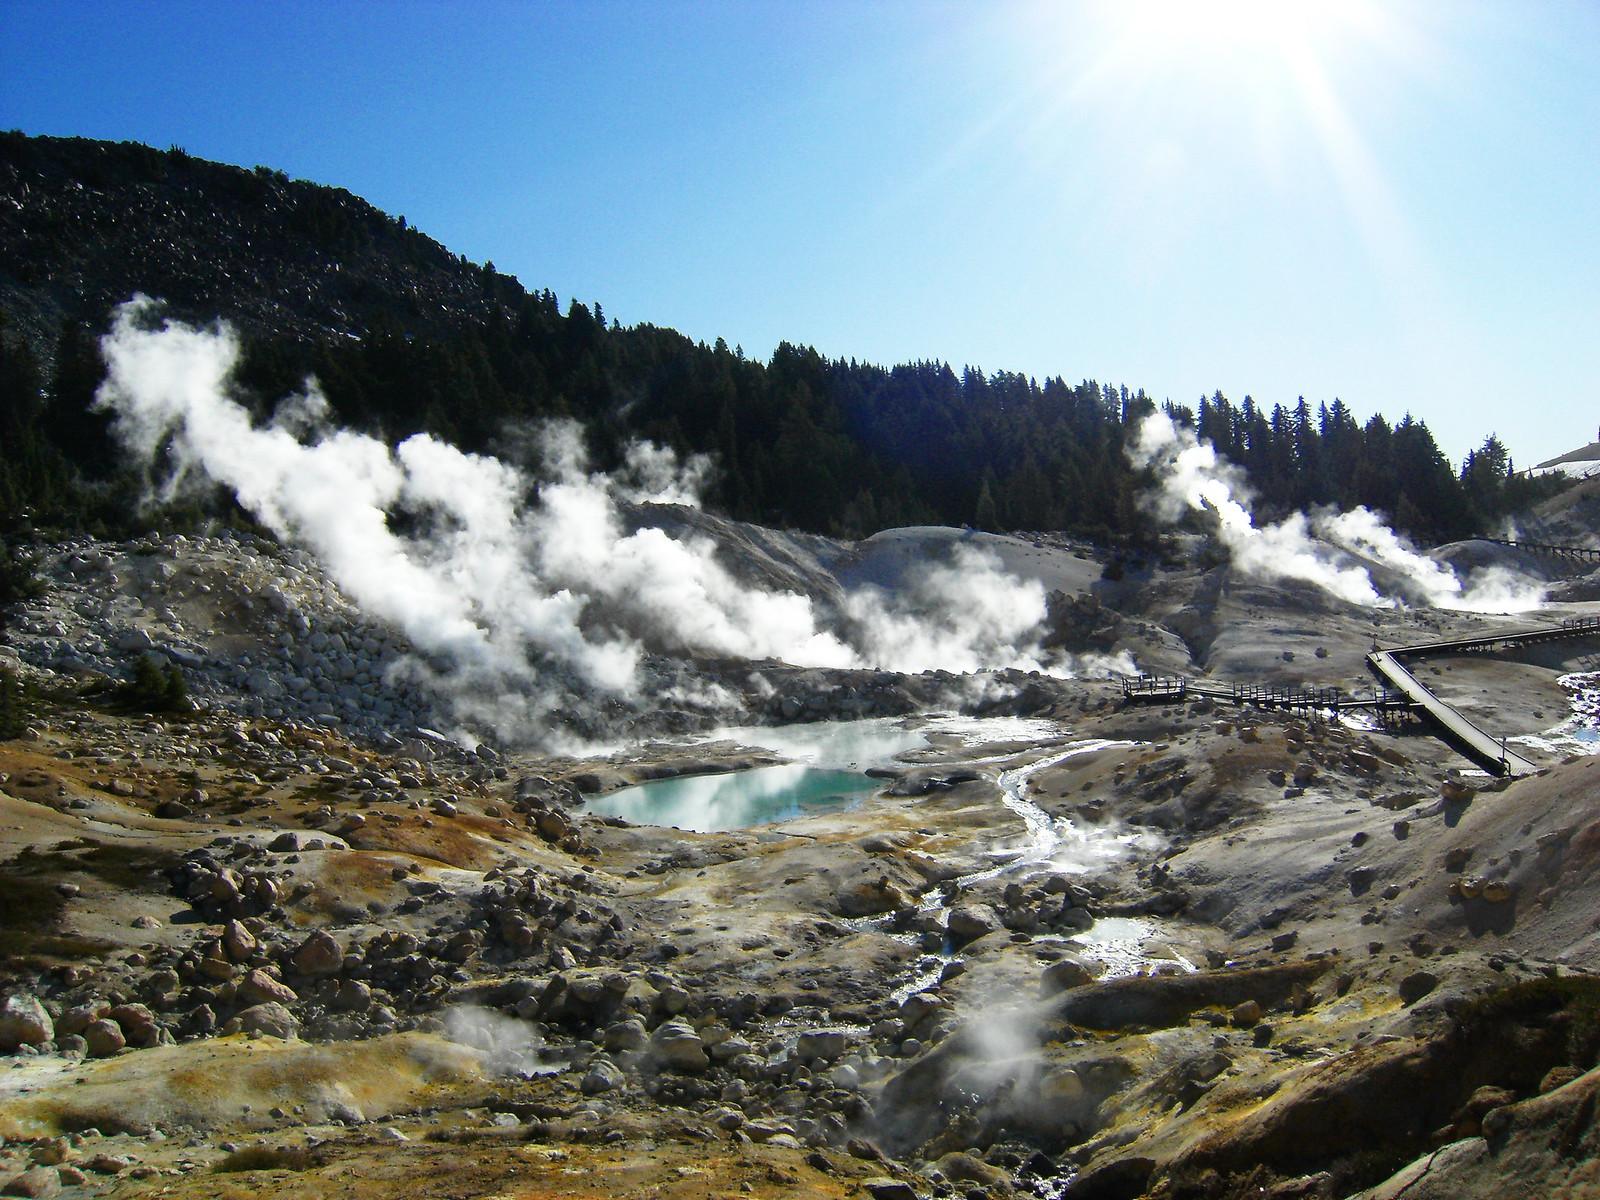 Lassen Volcanic